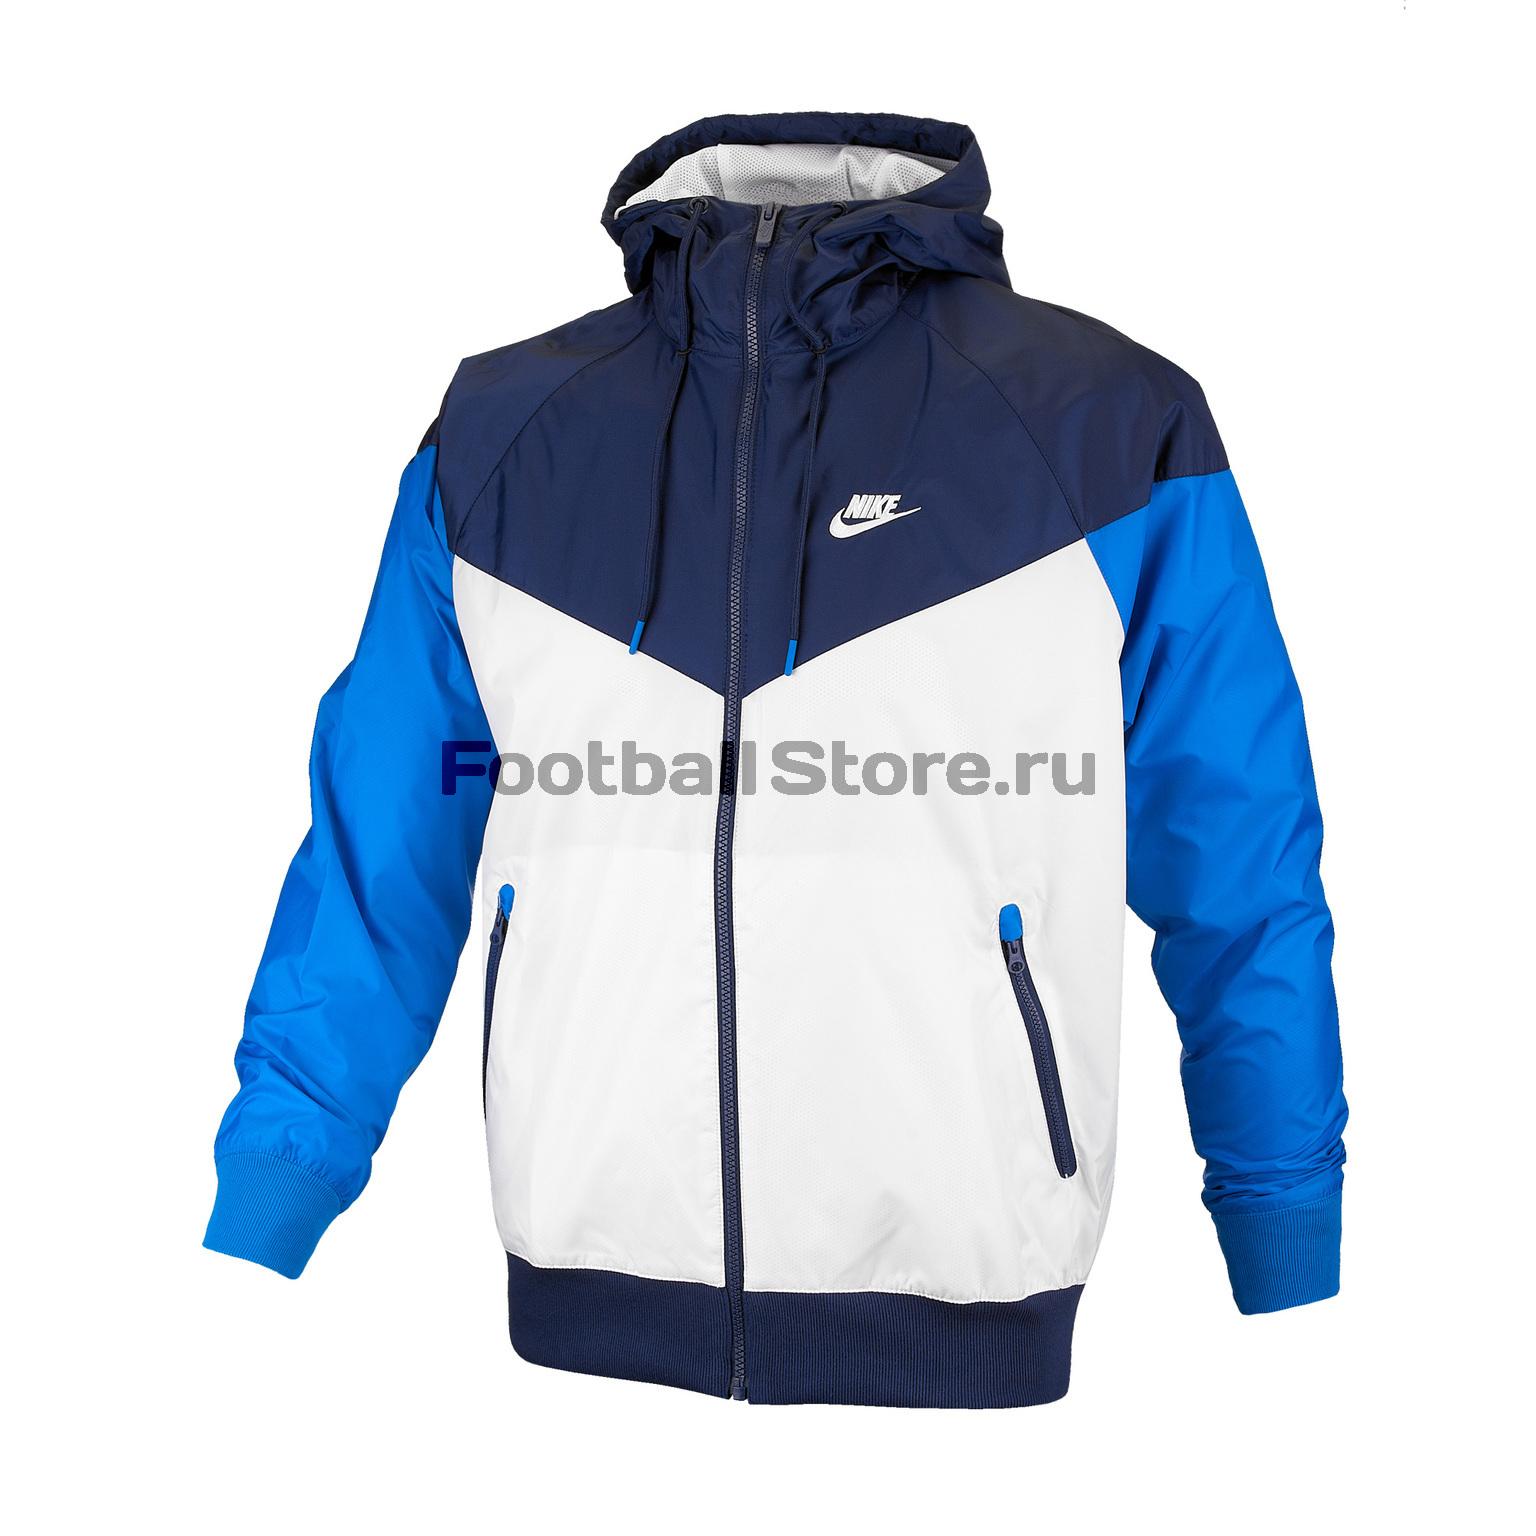 Куртка Nike NSW JKT AR2191-122 недорго, оригинальная цена